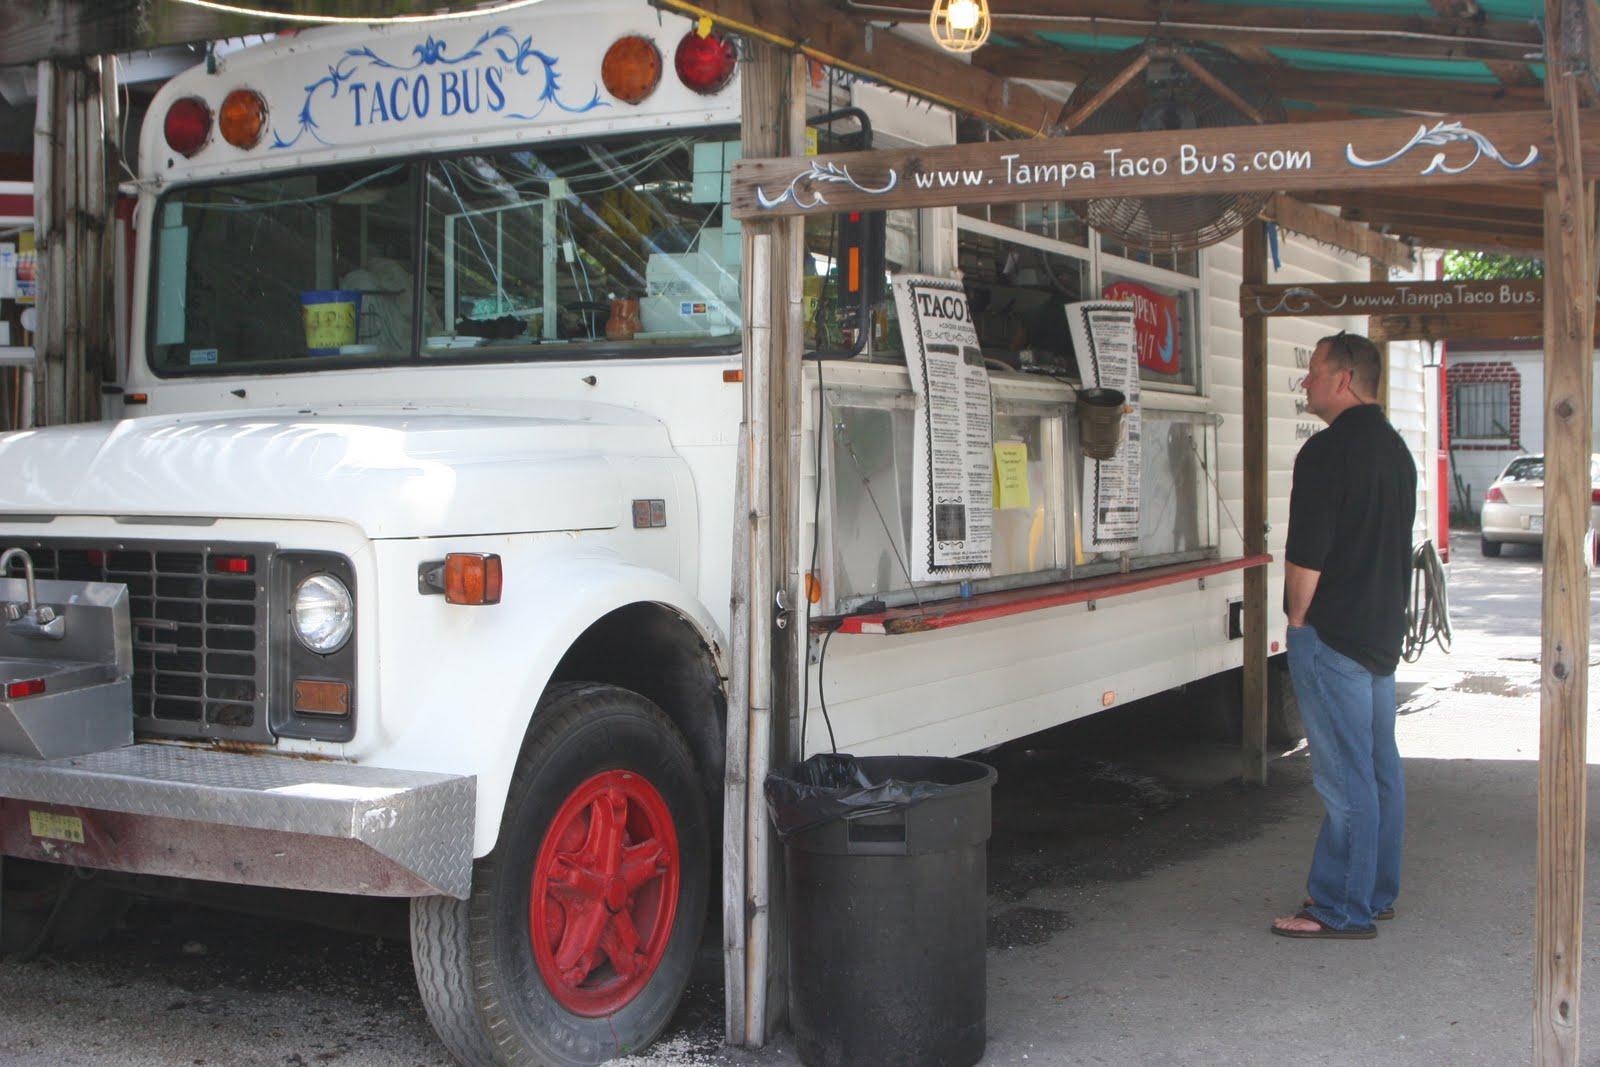 ADDetour  The Tampa Taco Bus  Midlife Road Trip